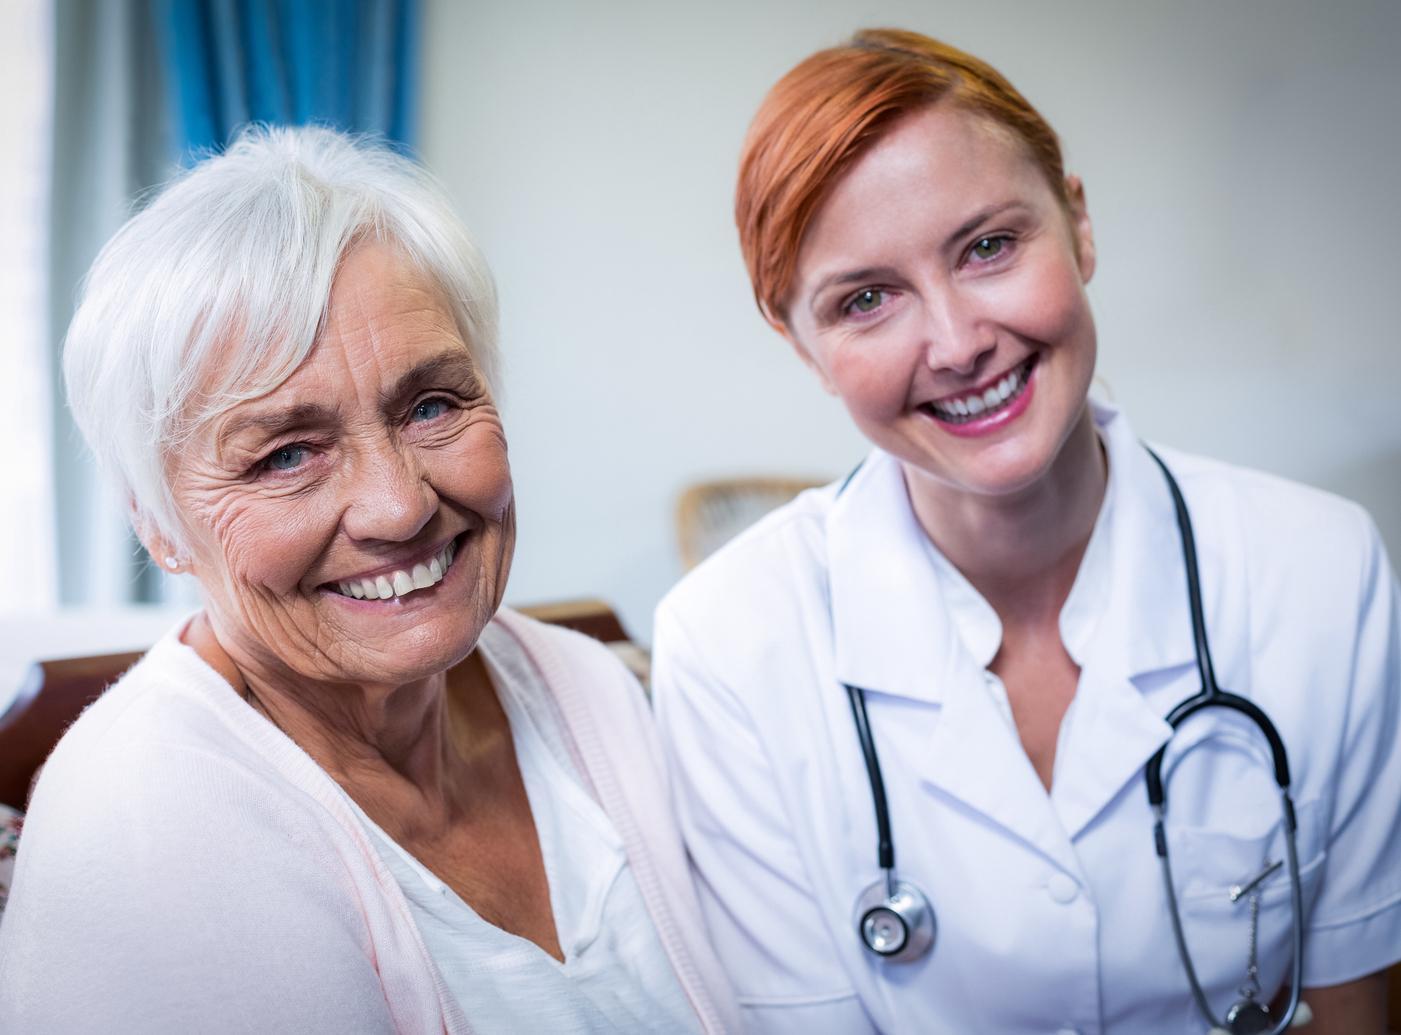 Smiling medical marijuana doctor and patient.